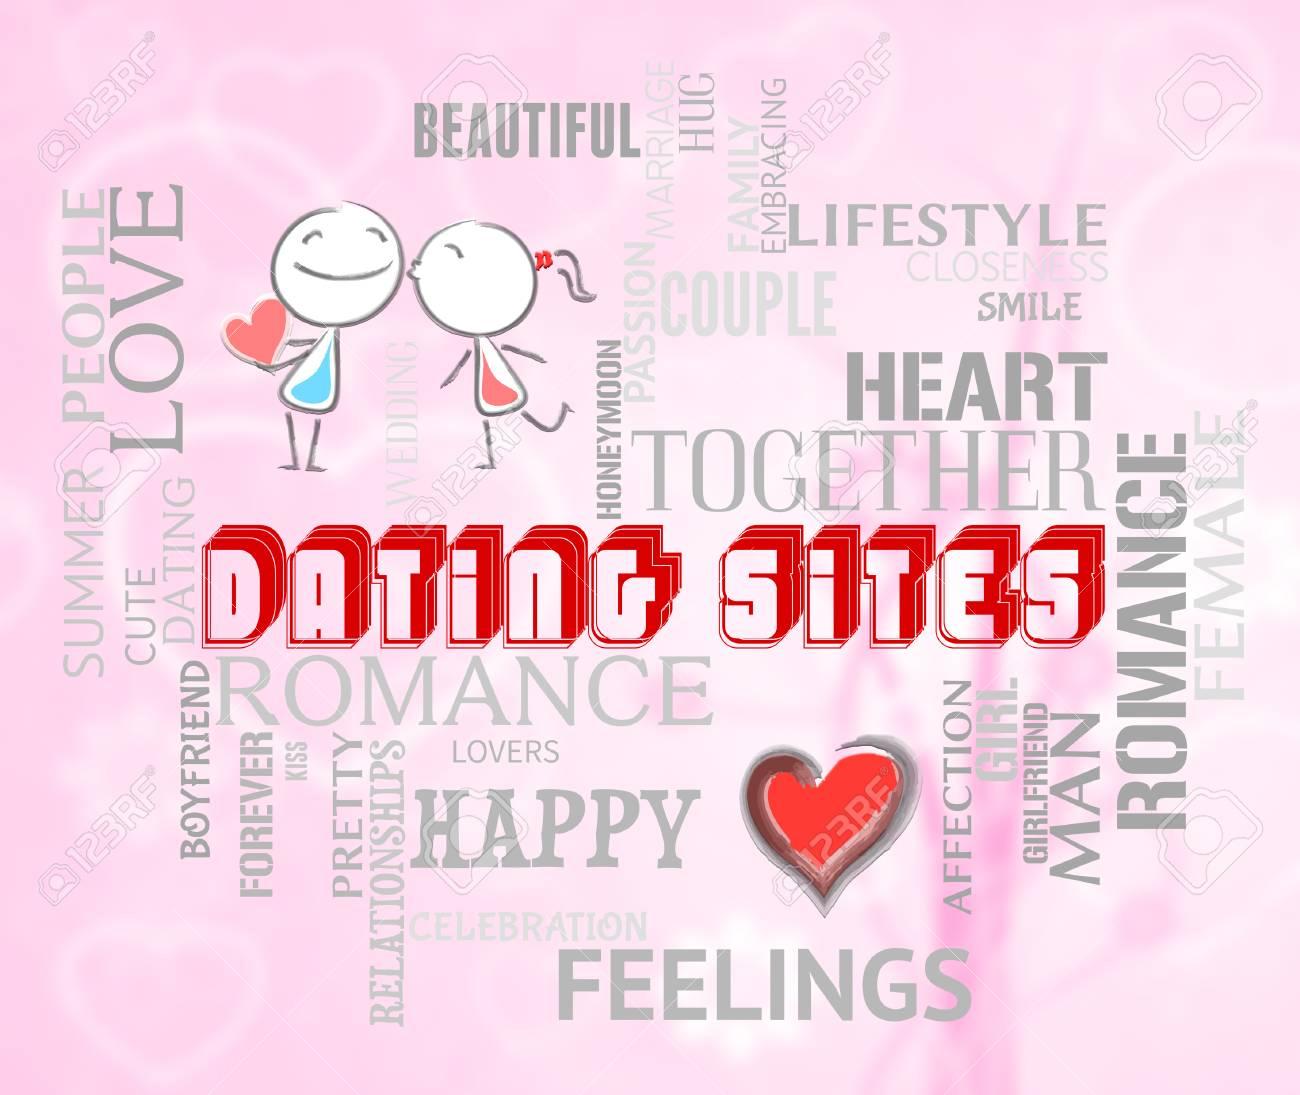 Atlanta gratuit Dating Service